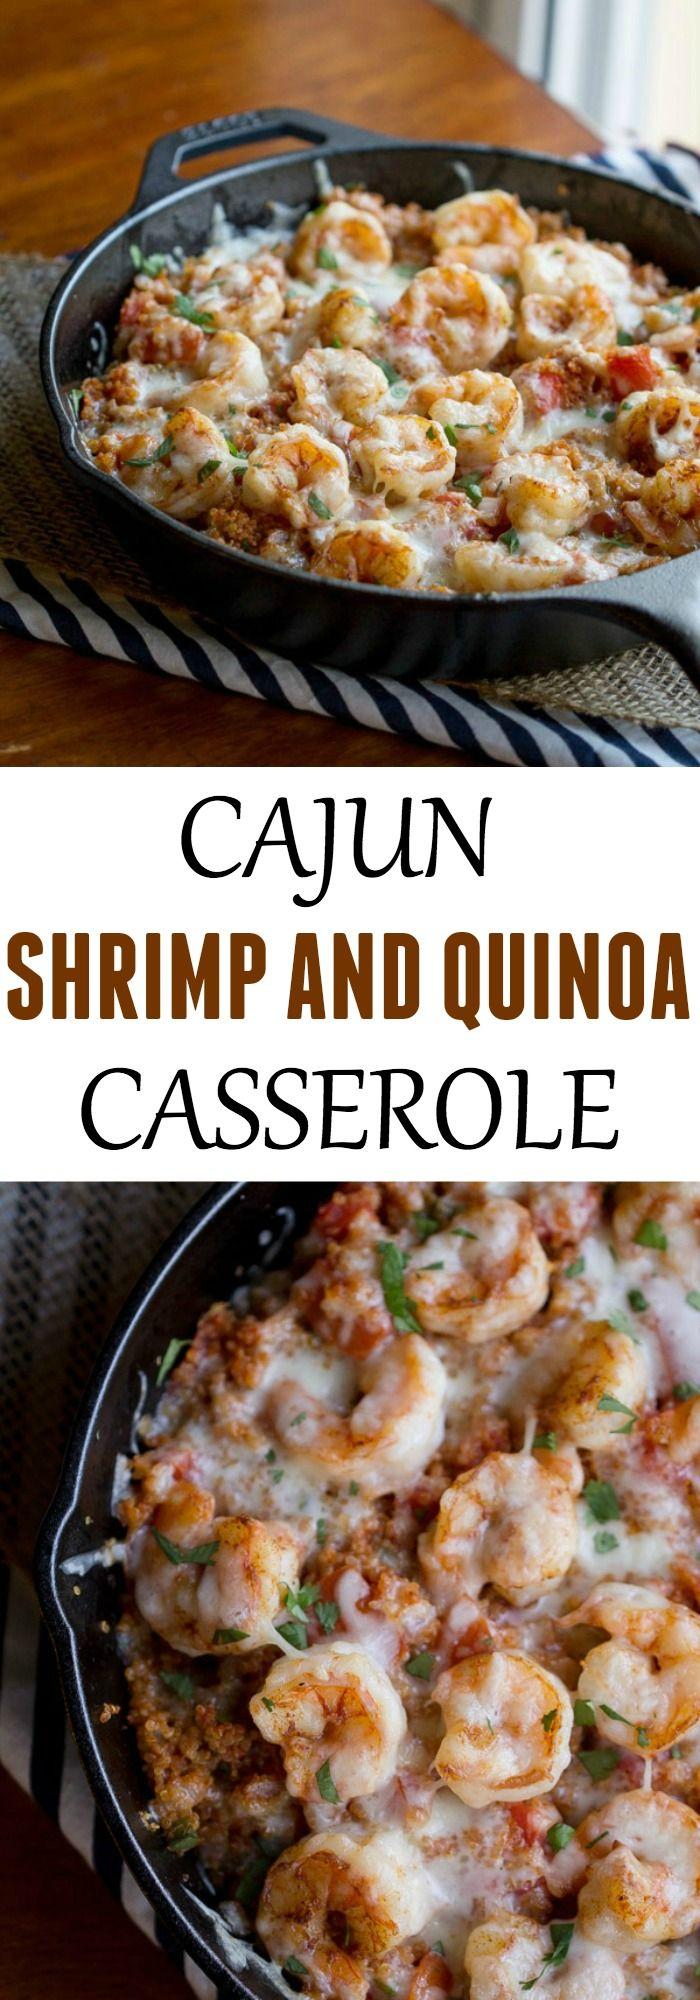 Super simple dinner recipe – Cajun Shrimp and Quinoa Casserole.